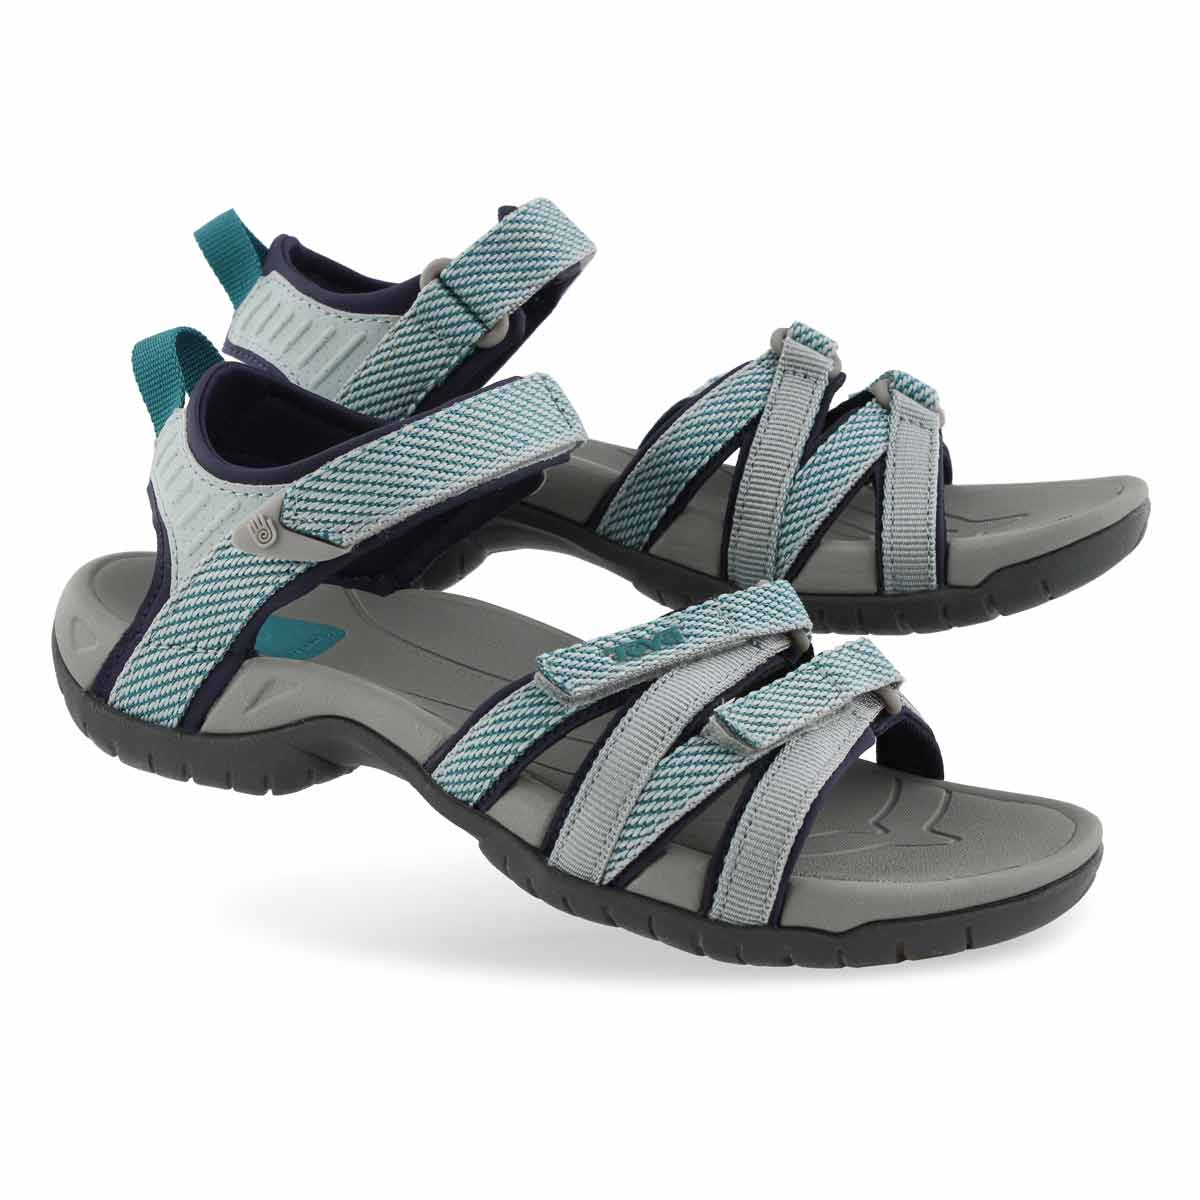 Lds Tirra hera grey mist sport sandal